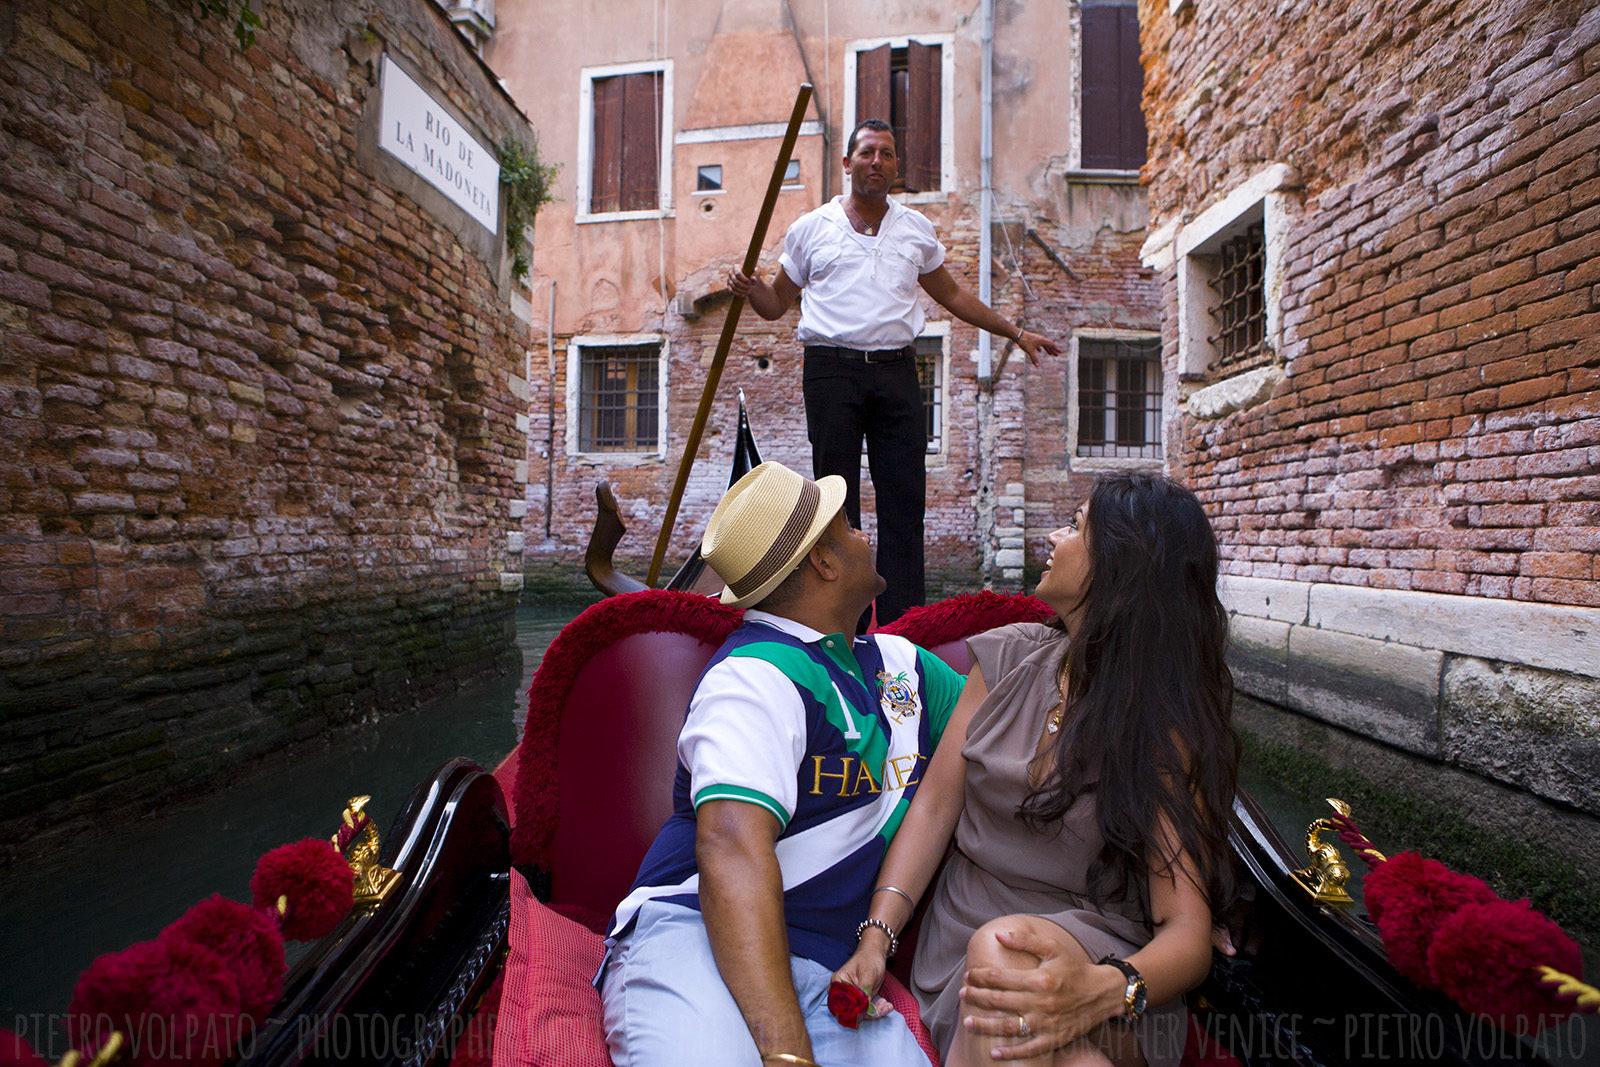 photographer-venice-honeymoon-photo-shoot-20130711_02